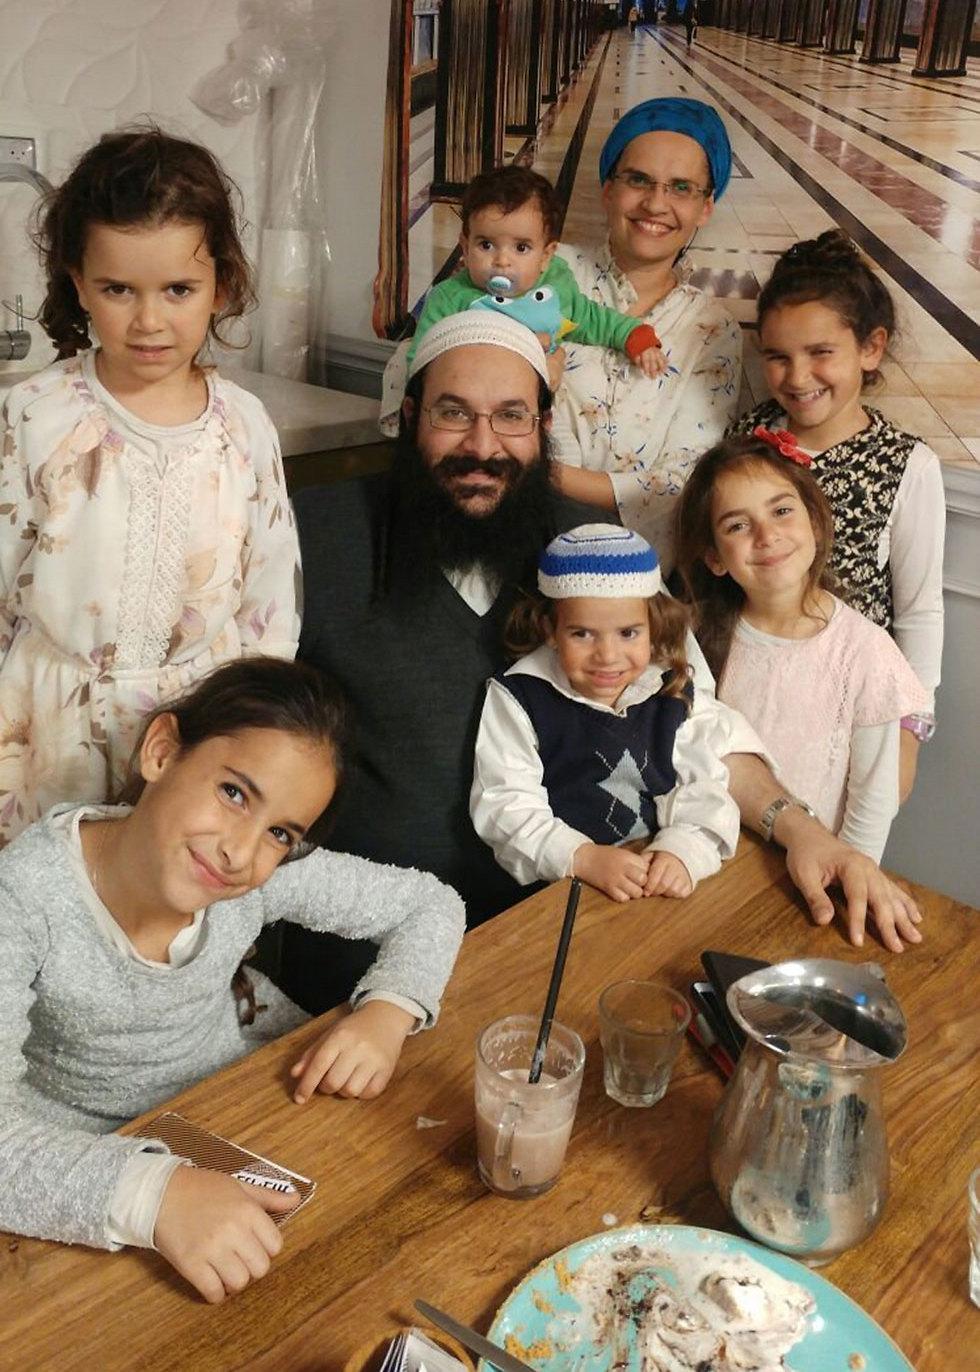 Rabbi Raziel Shevah and his family